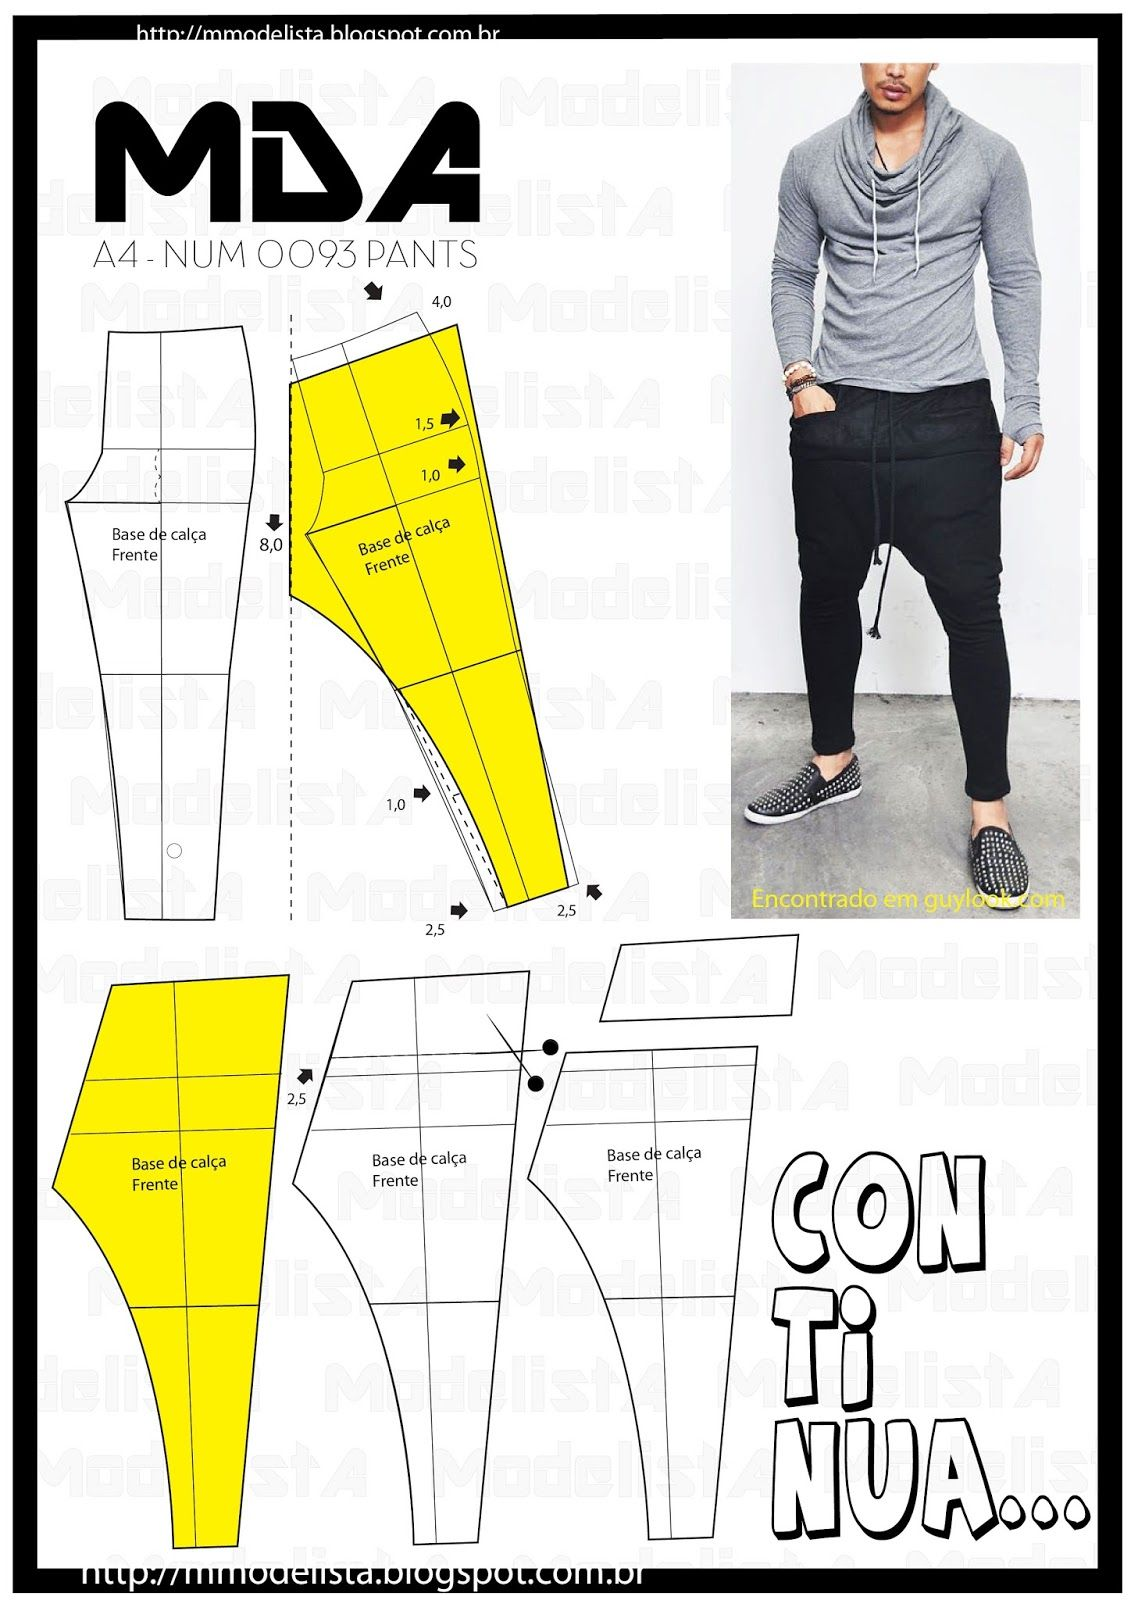 A4 NUM 0093 PANTS | Nähen, Herrenschnitte und Nähideen